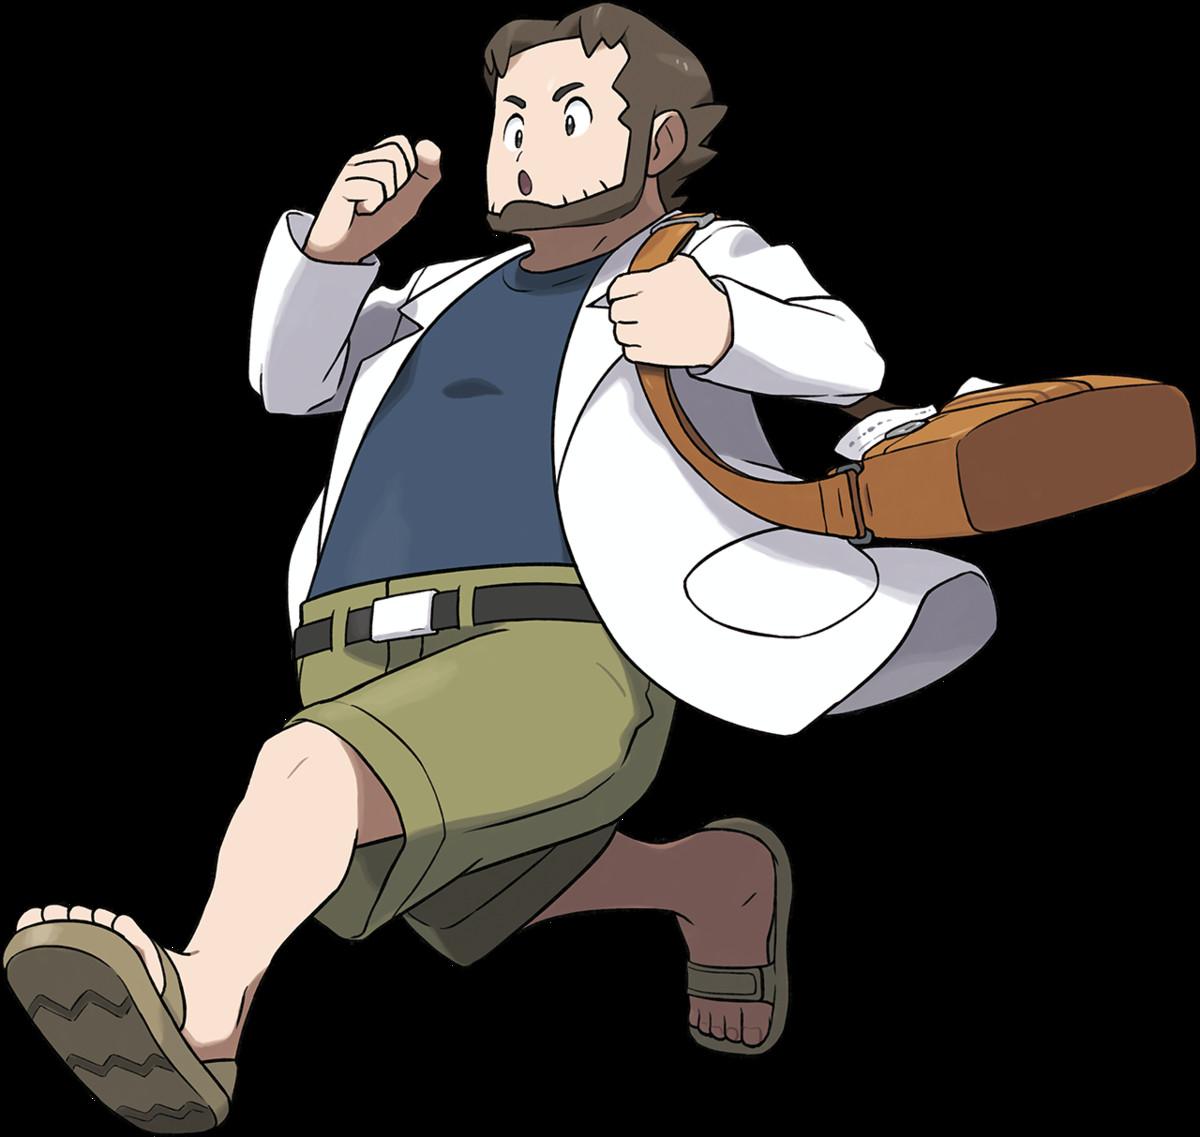 Ausmalbilder Pokemon Rayquaza Inspirierend Professor Birch Bulbapedia the Munity Driven Pokémon Sammlung